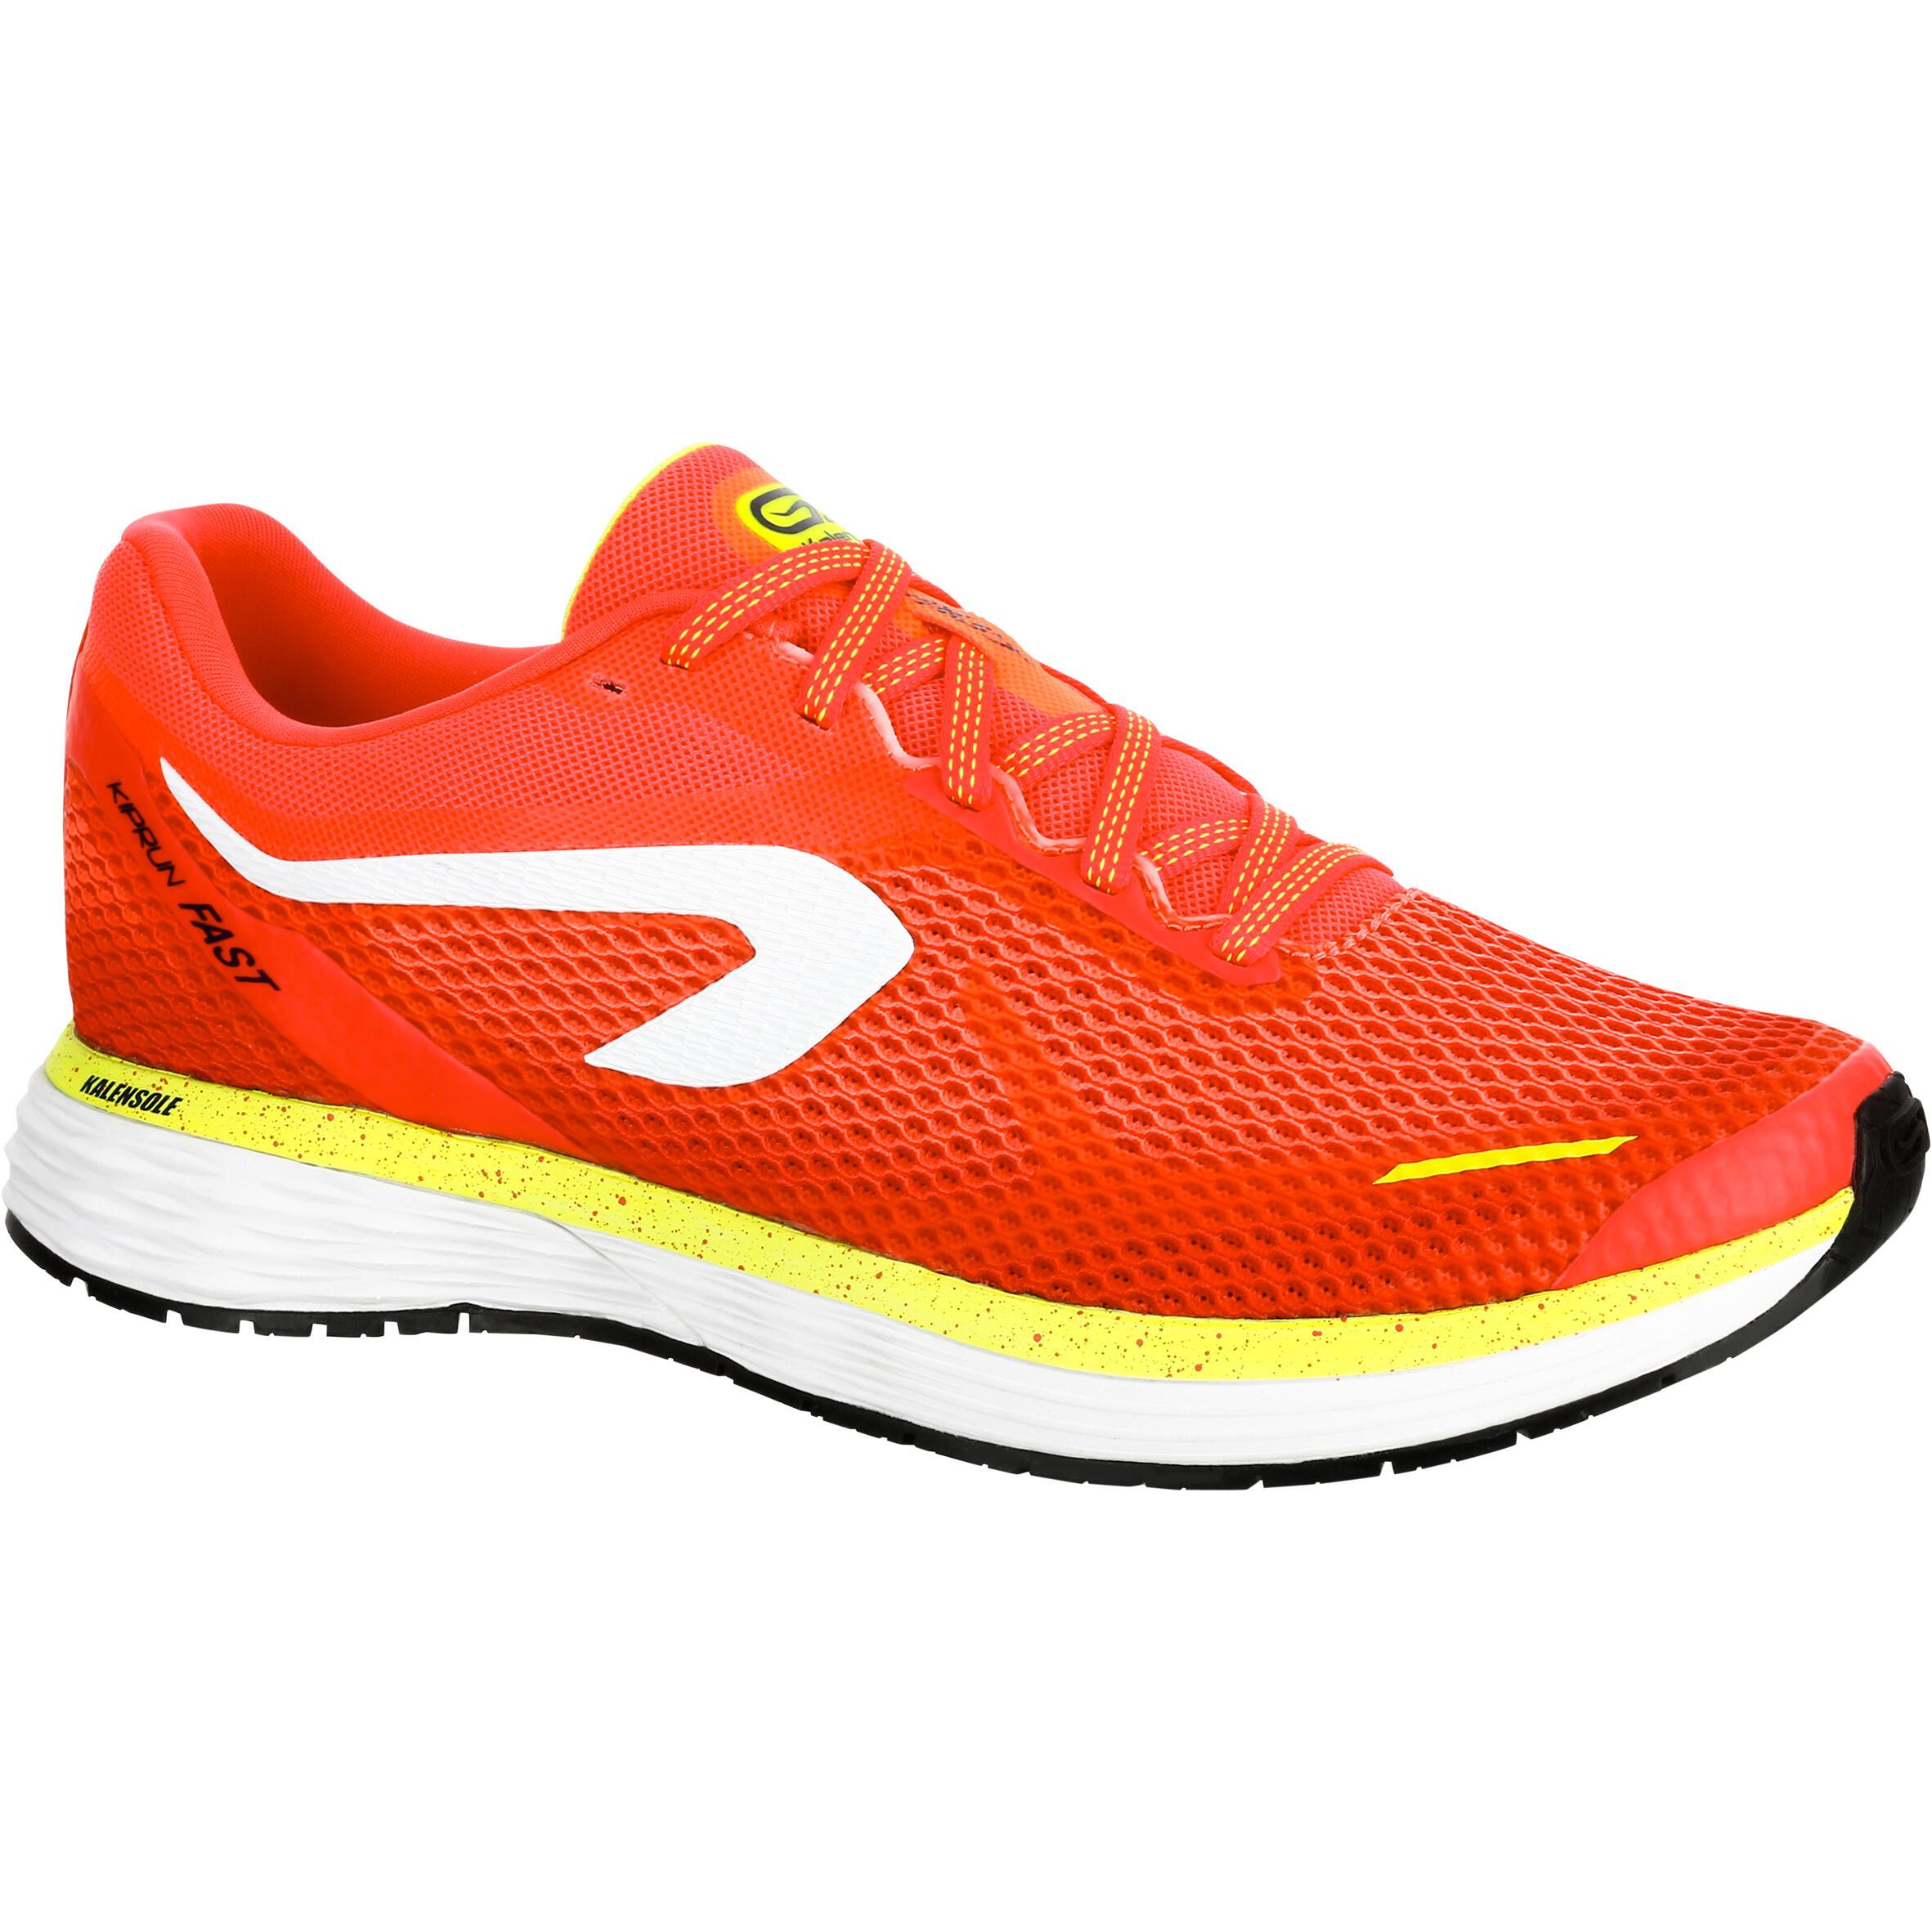 2501869 Kalenji Hardloopschoenen voor dames Kalenji Kiprun Fast koraalrood geel